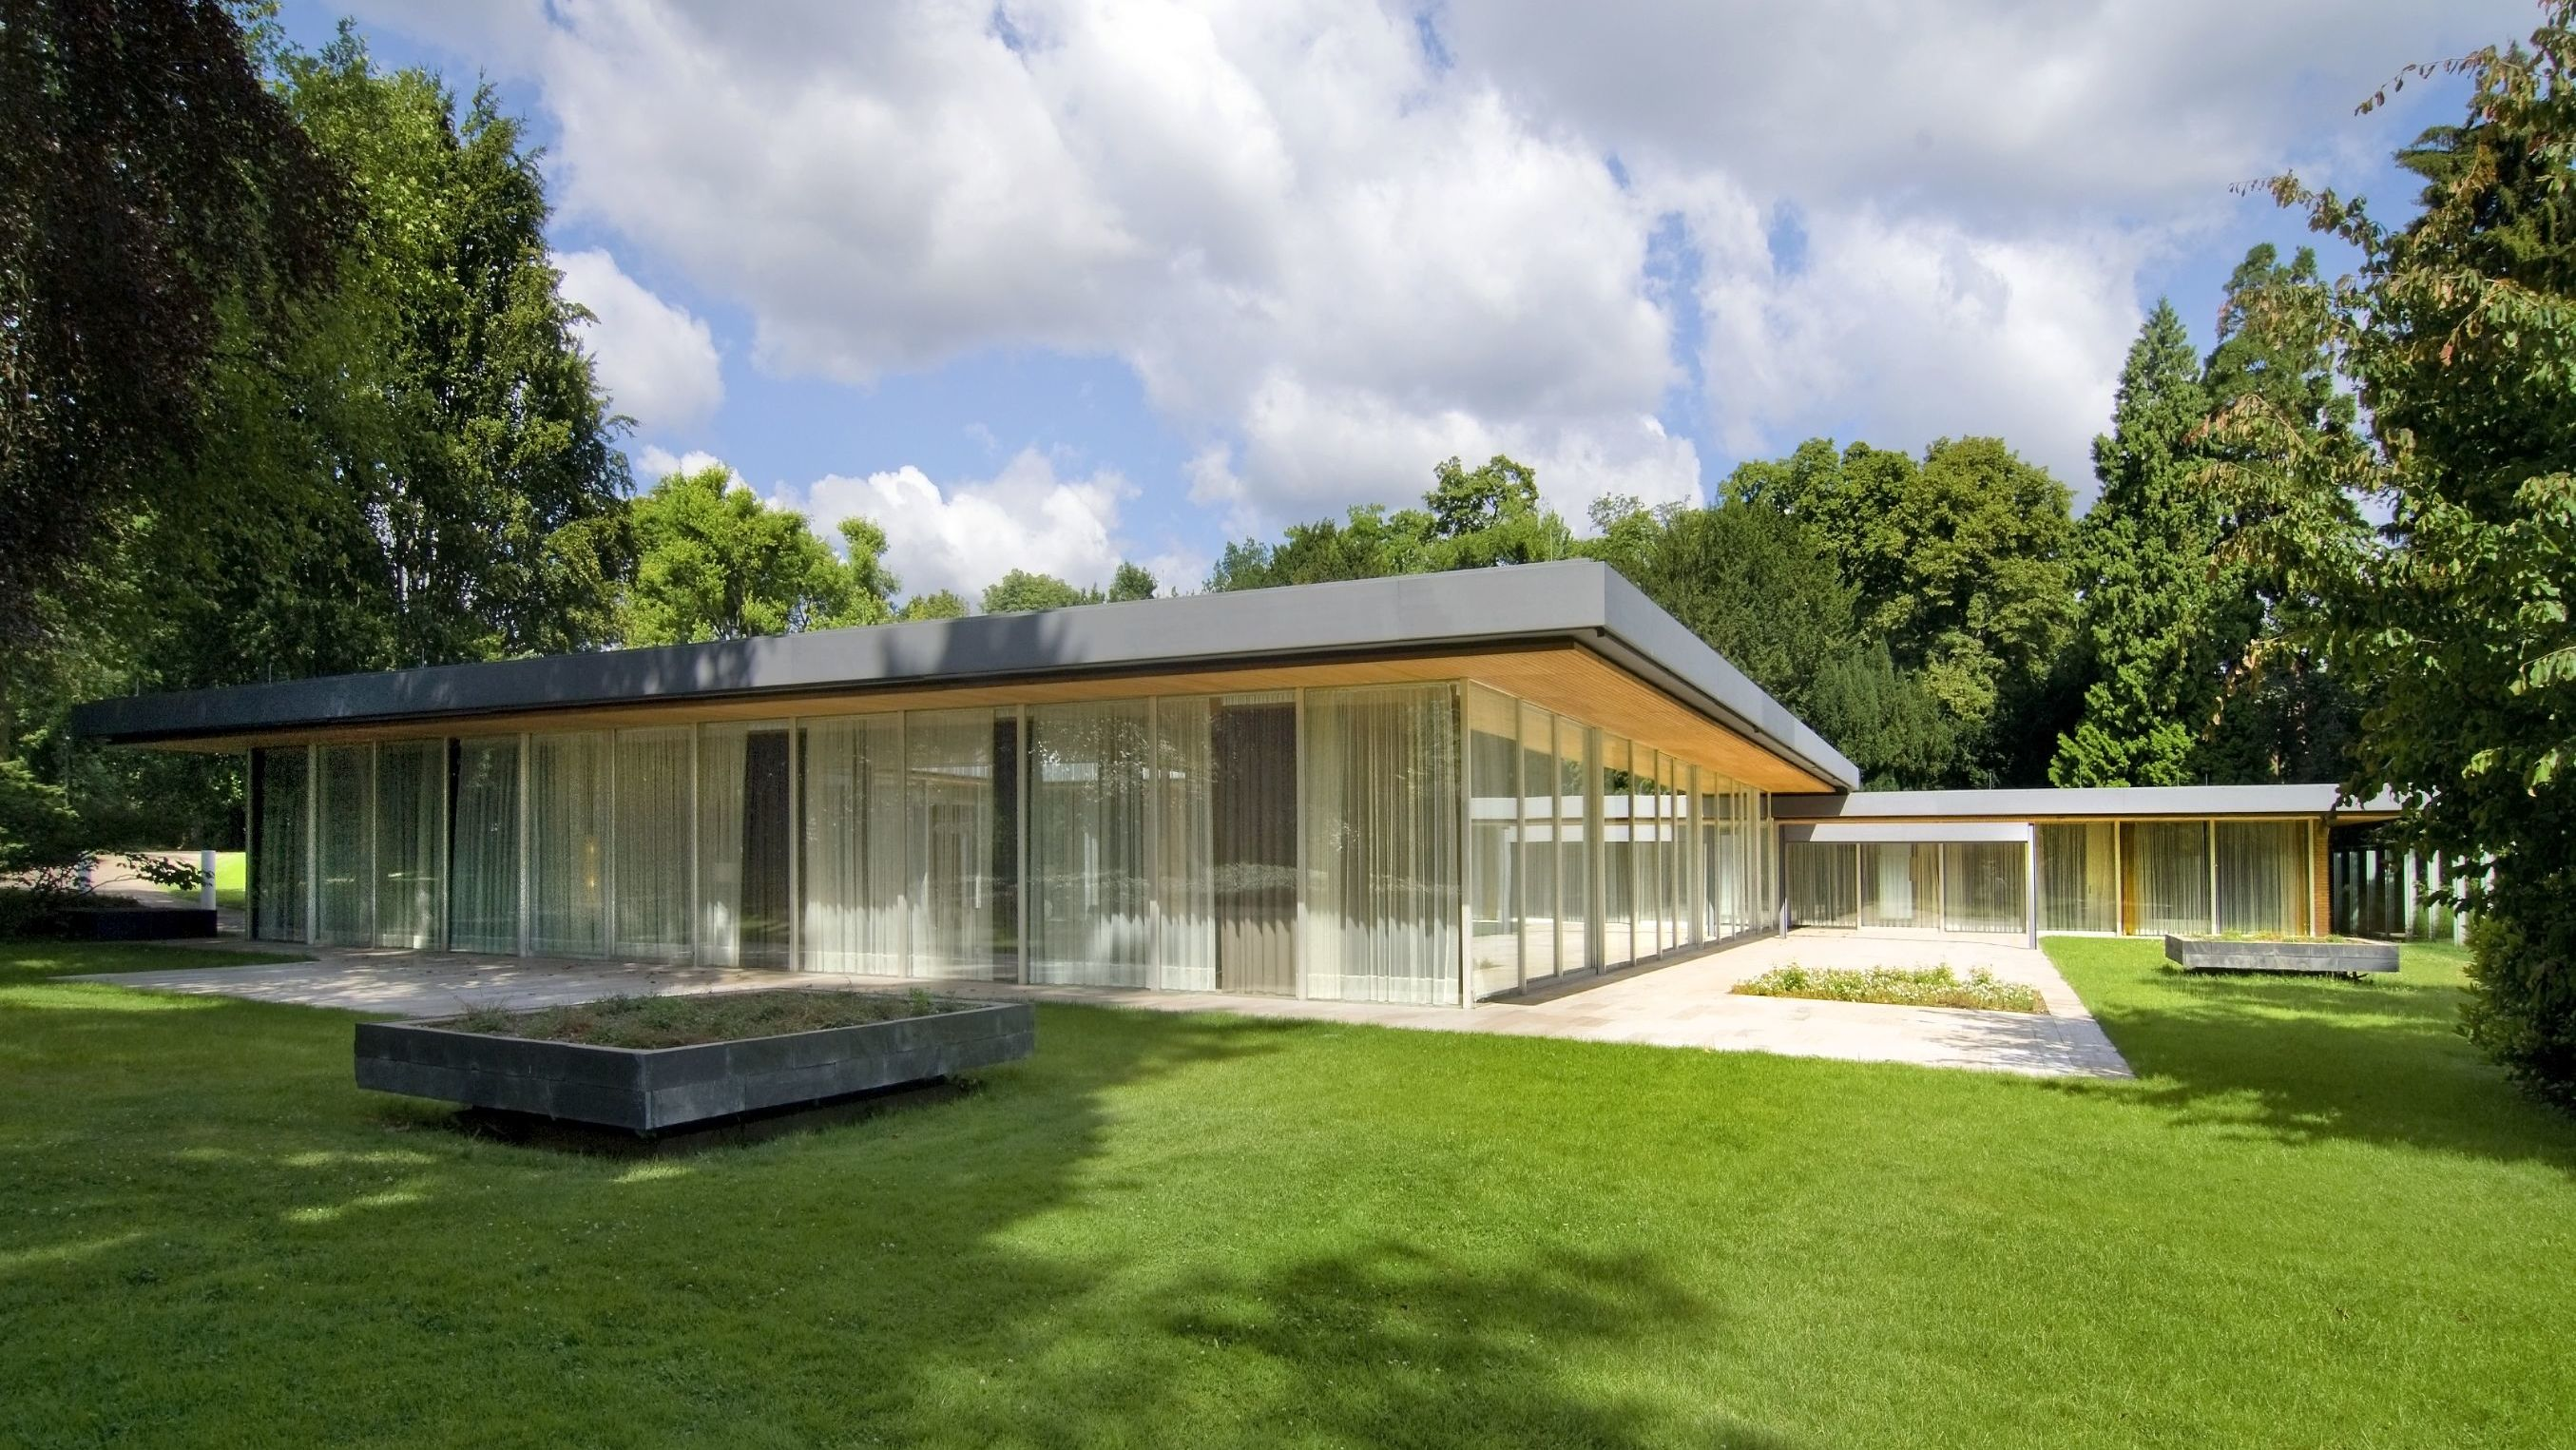 Haus der Geschichte Bonn